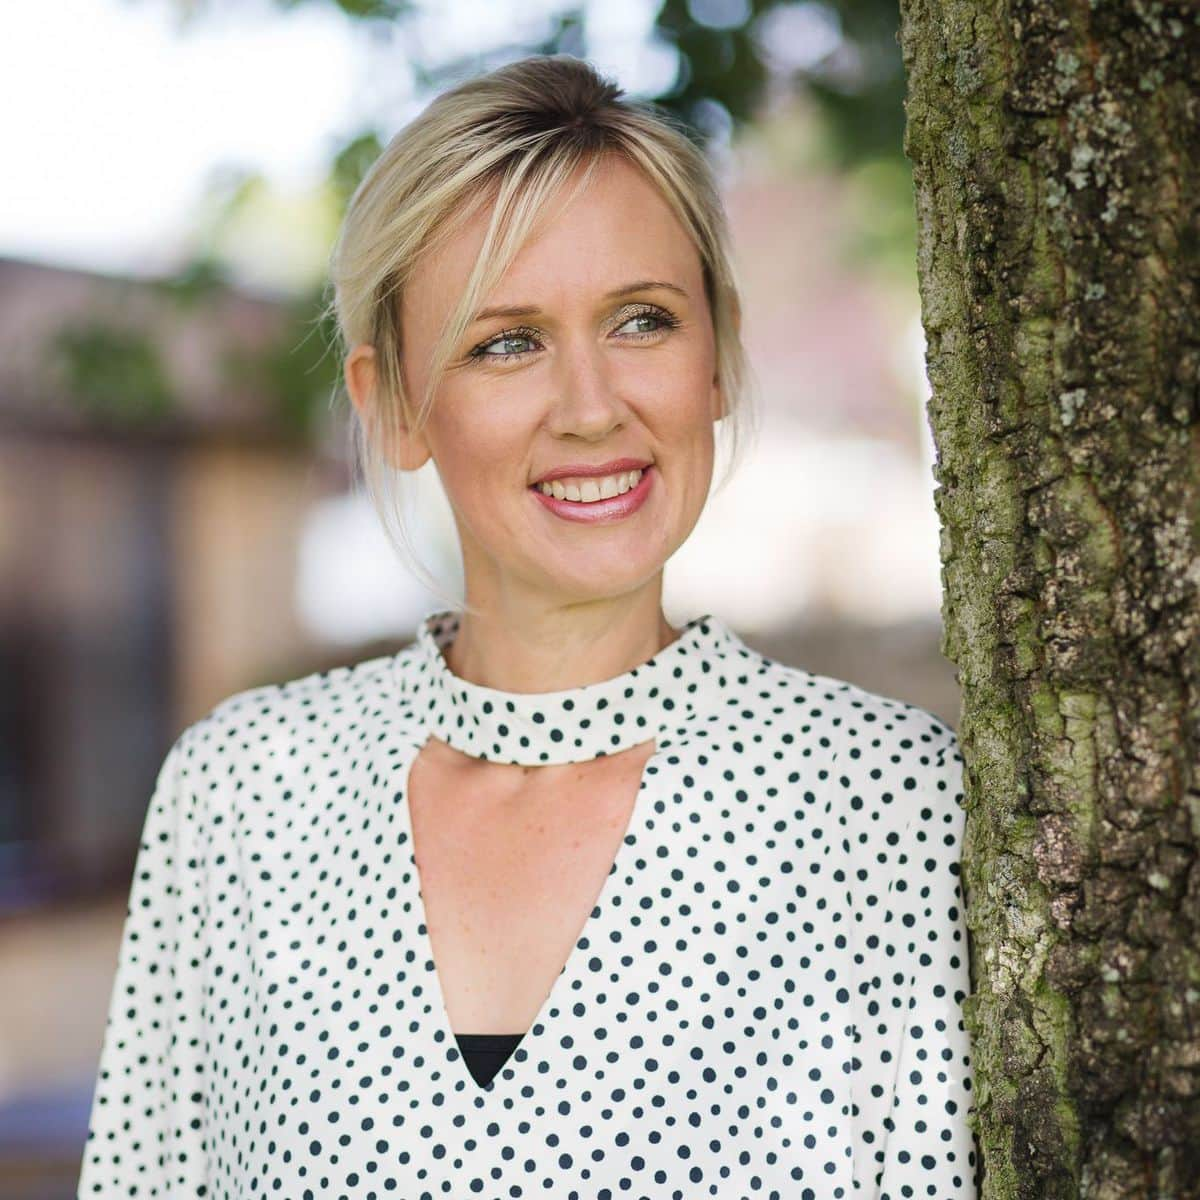 Gemma Prosser